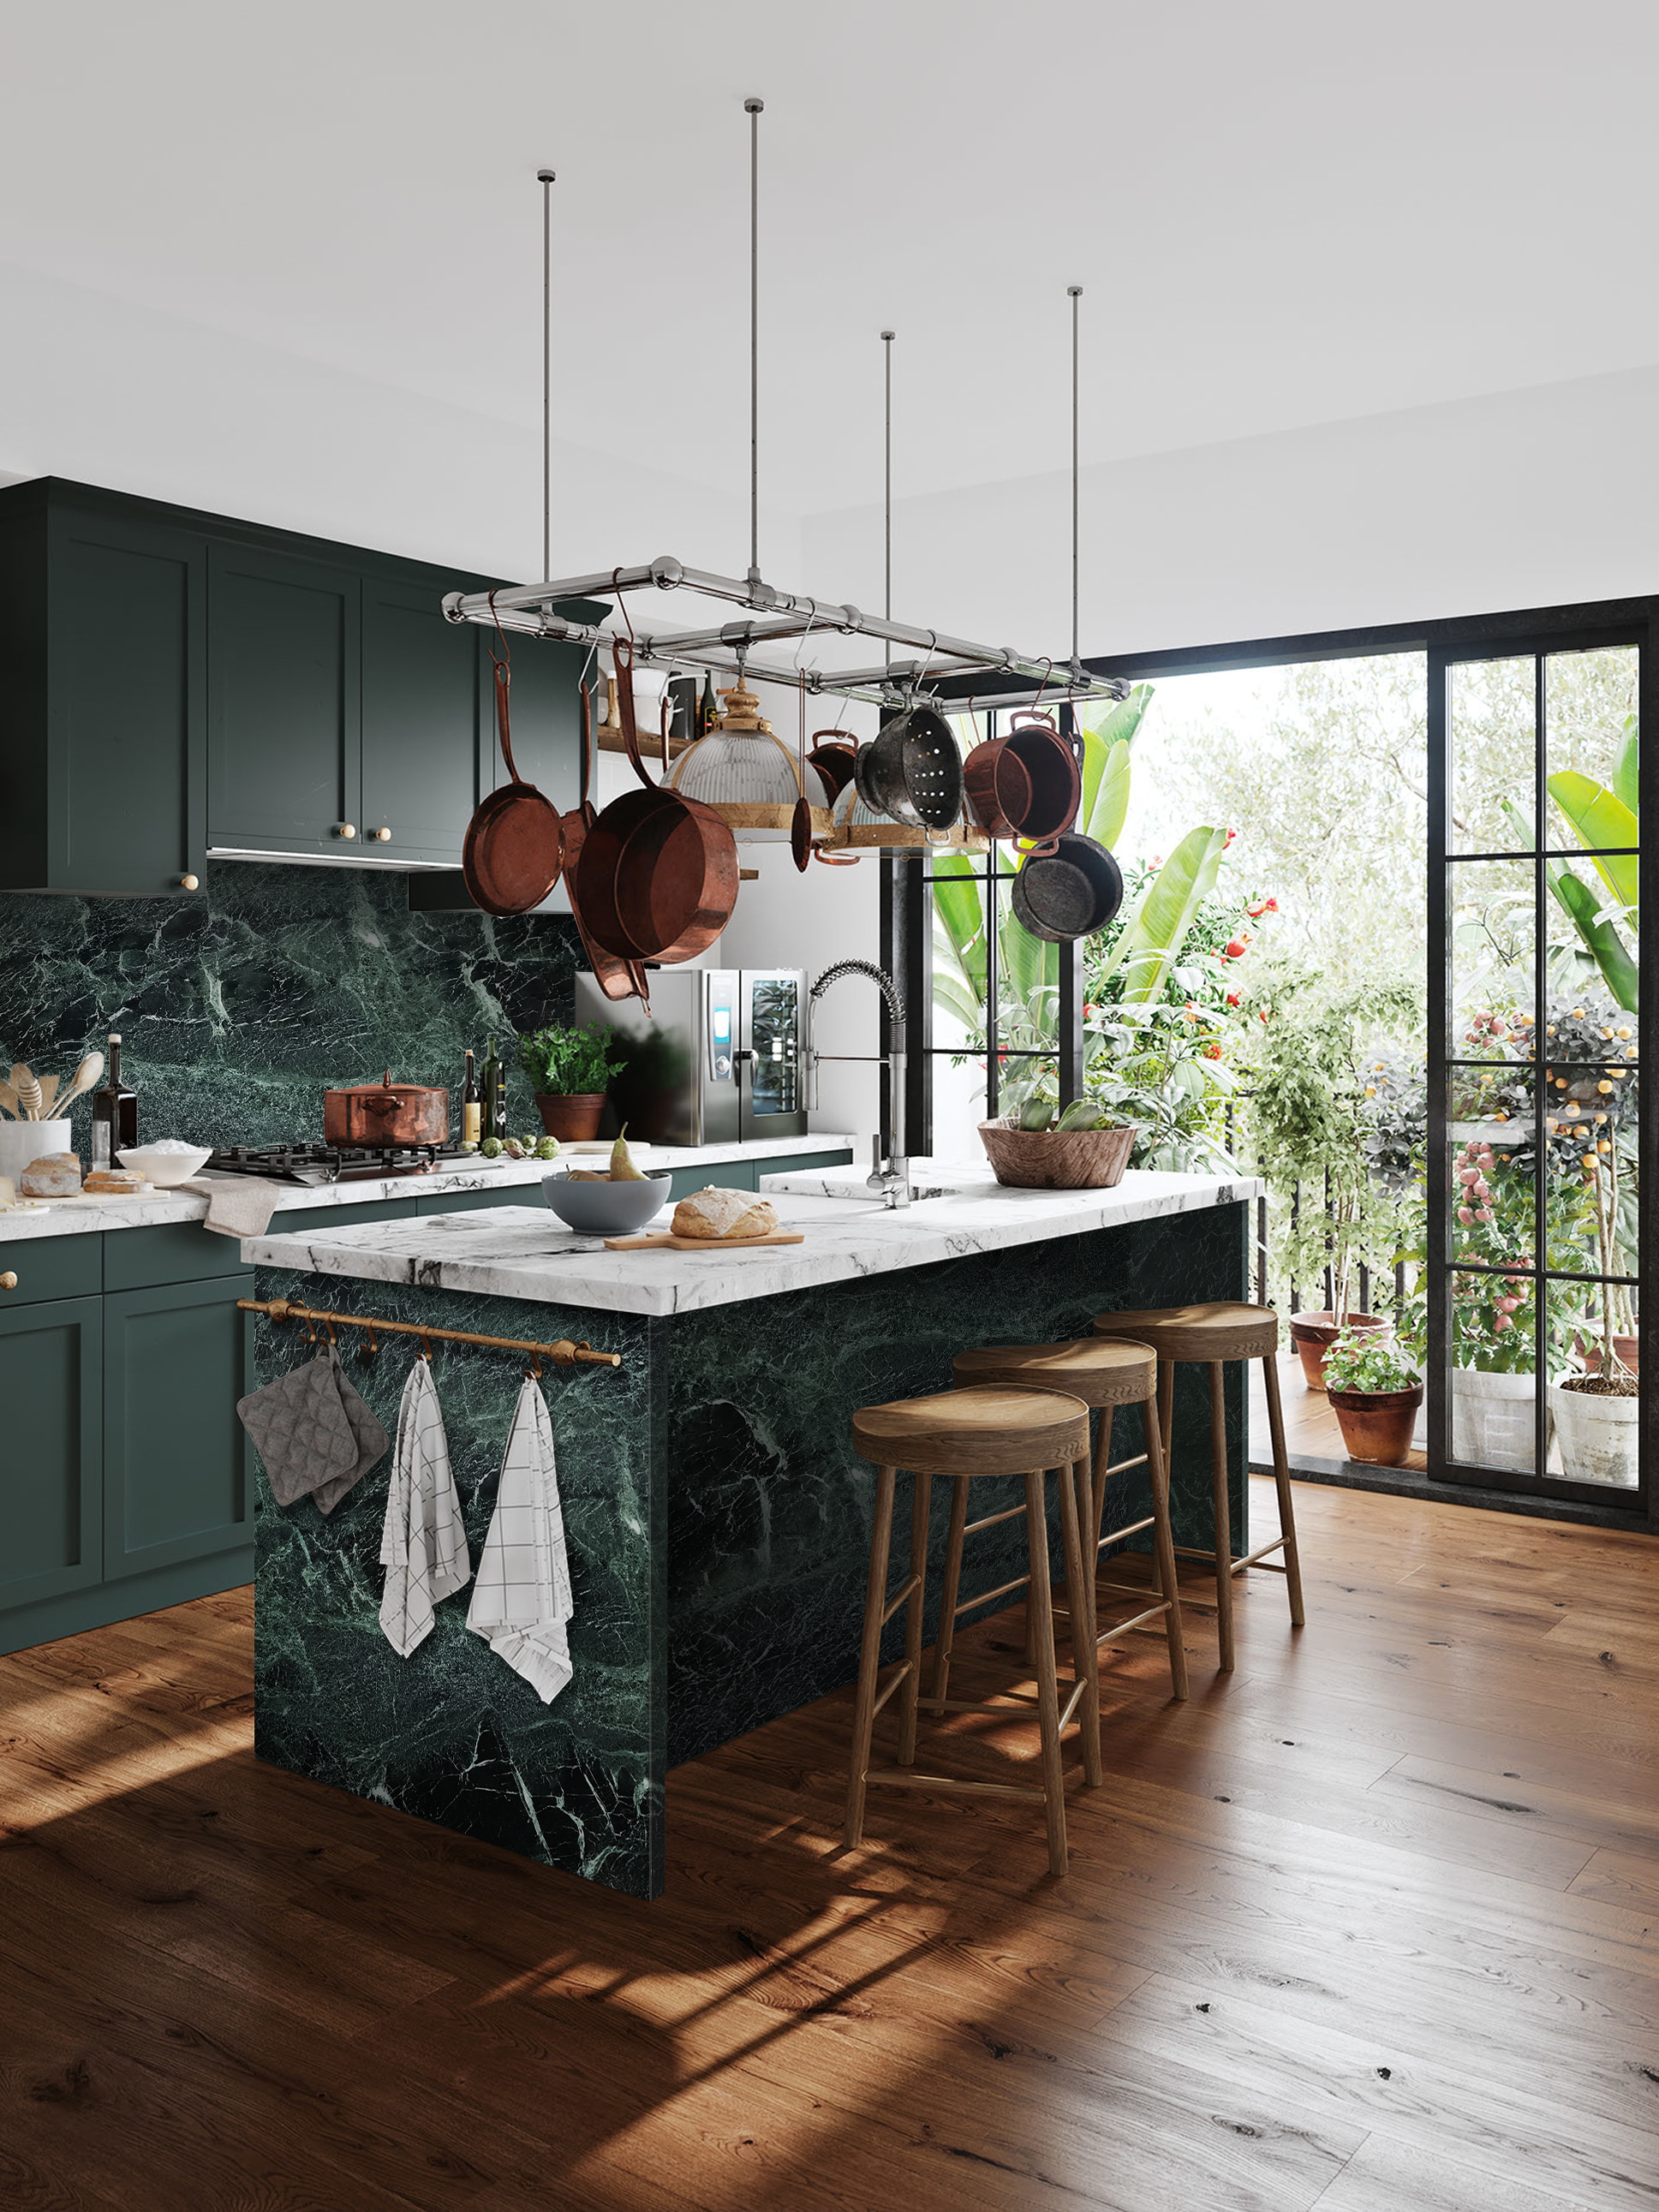 Cullifords Green Verde Tinos Carrara Mix Kitchen Marble Surface